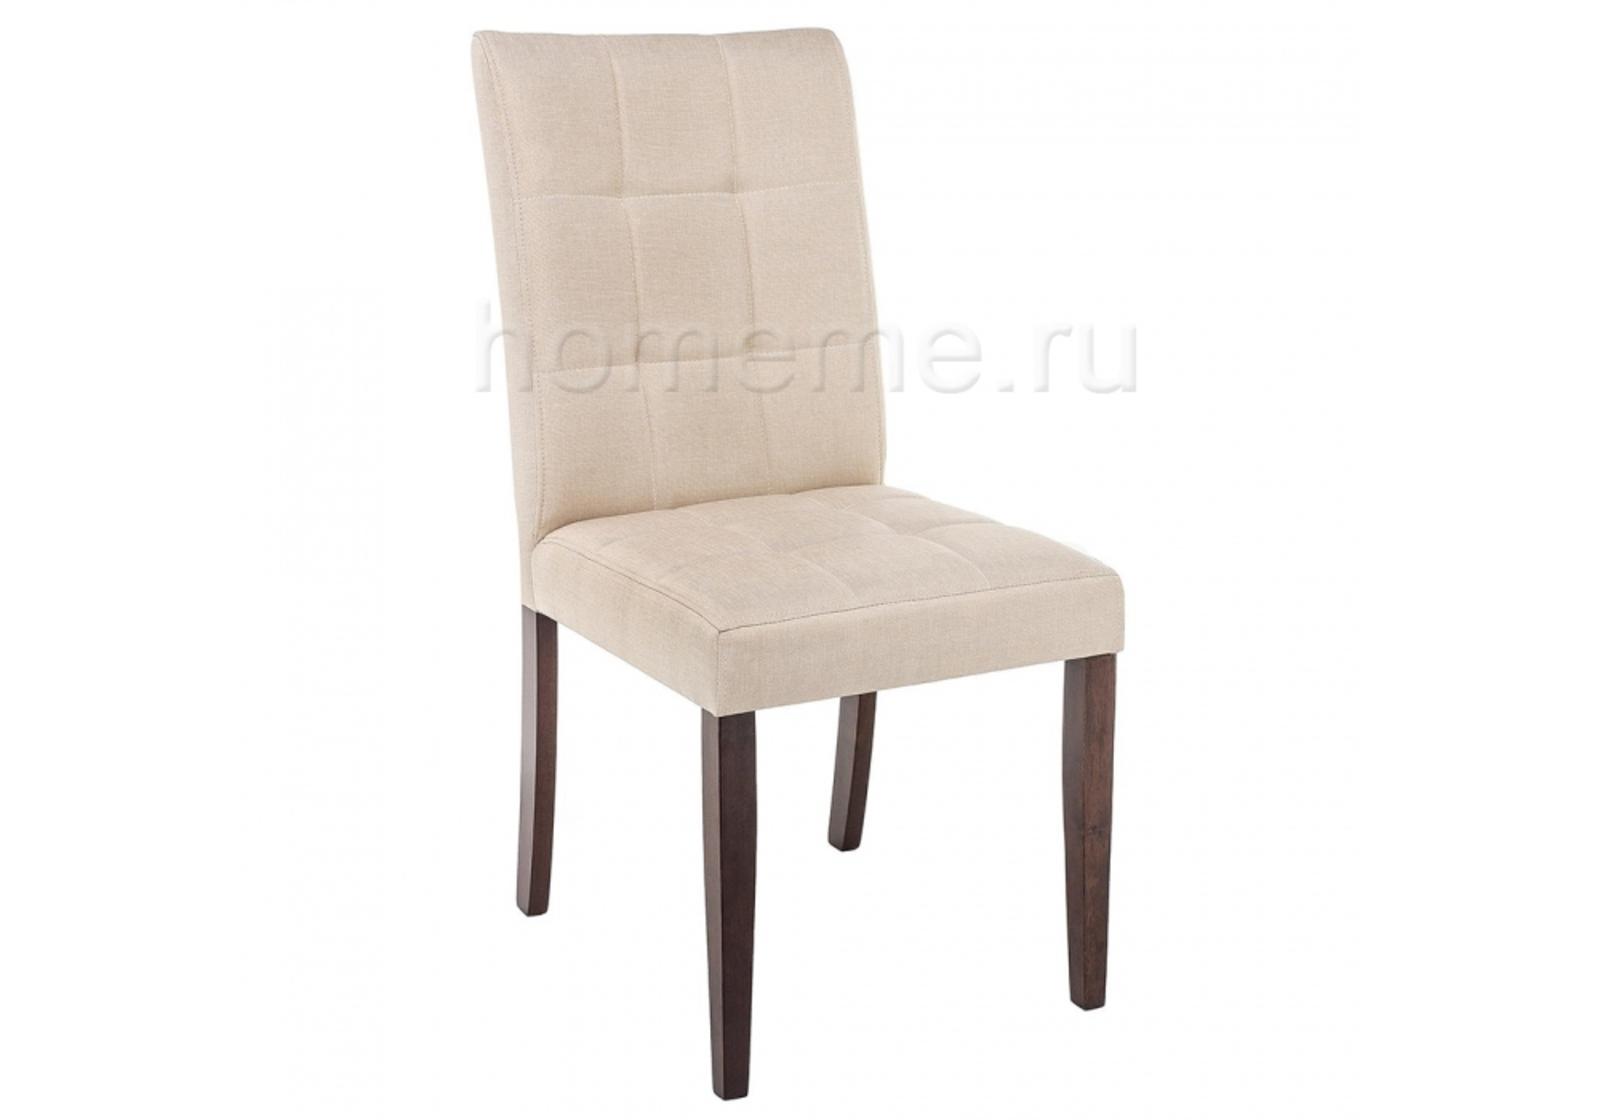 Стул HomeMe Madina dark walnut / fabric cream 11029 от Homeme.ru